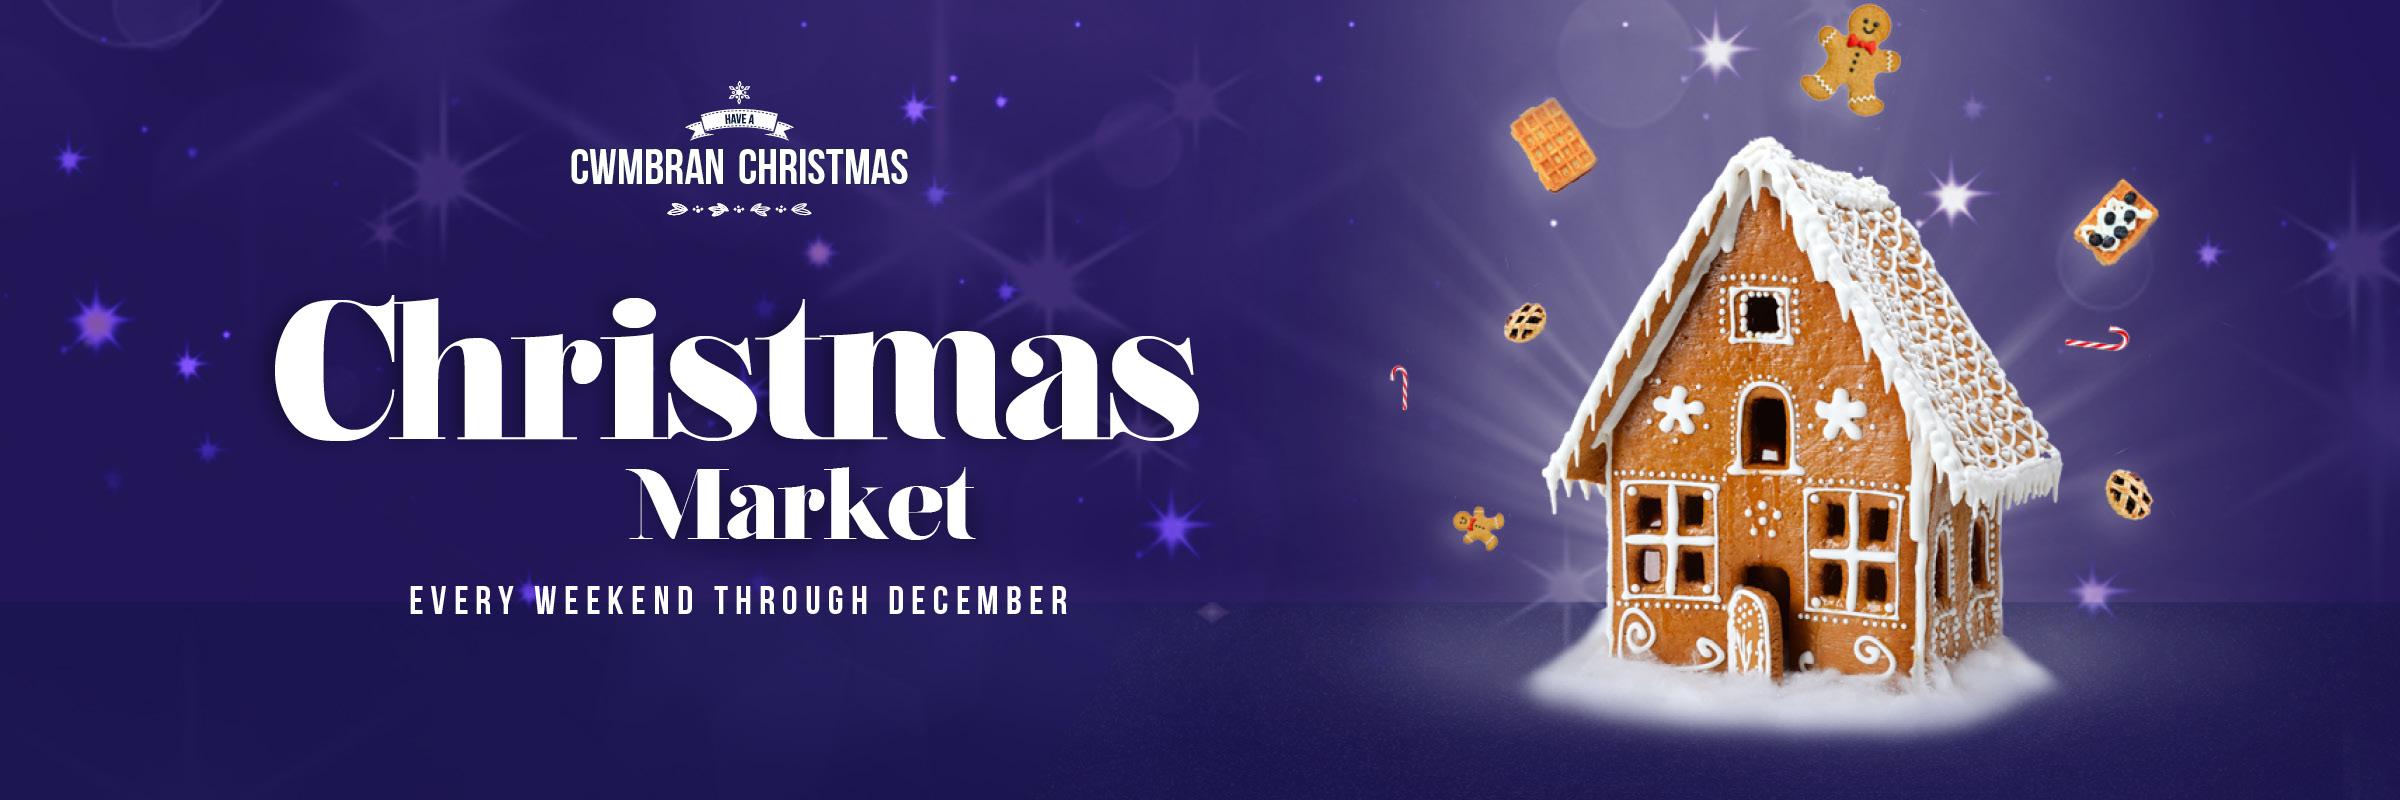 Cwmbran Christmas Market!